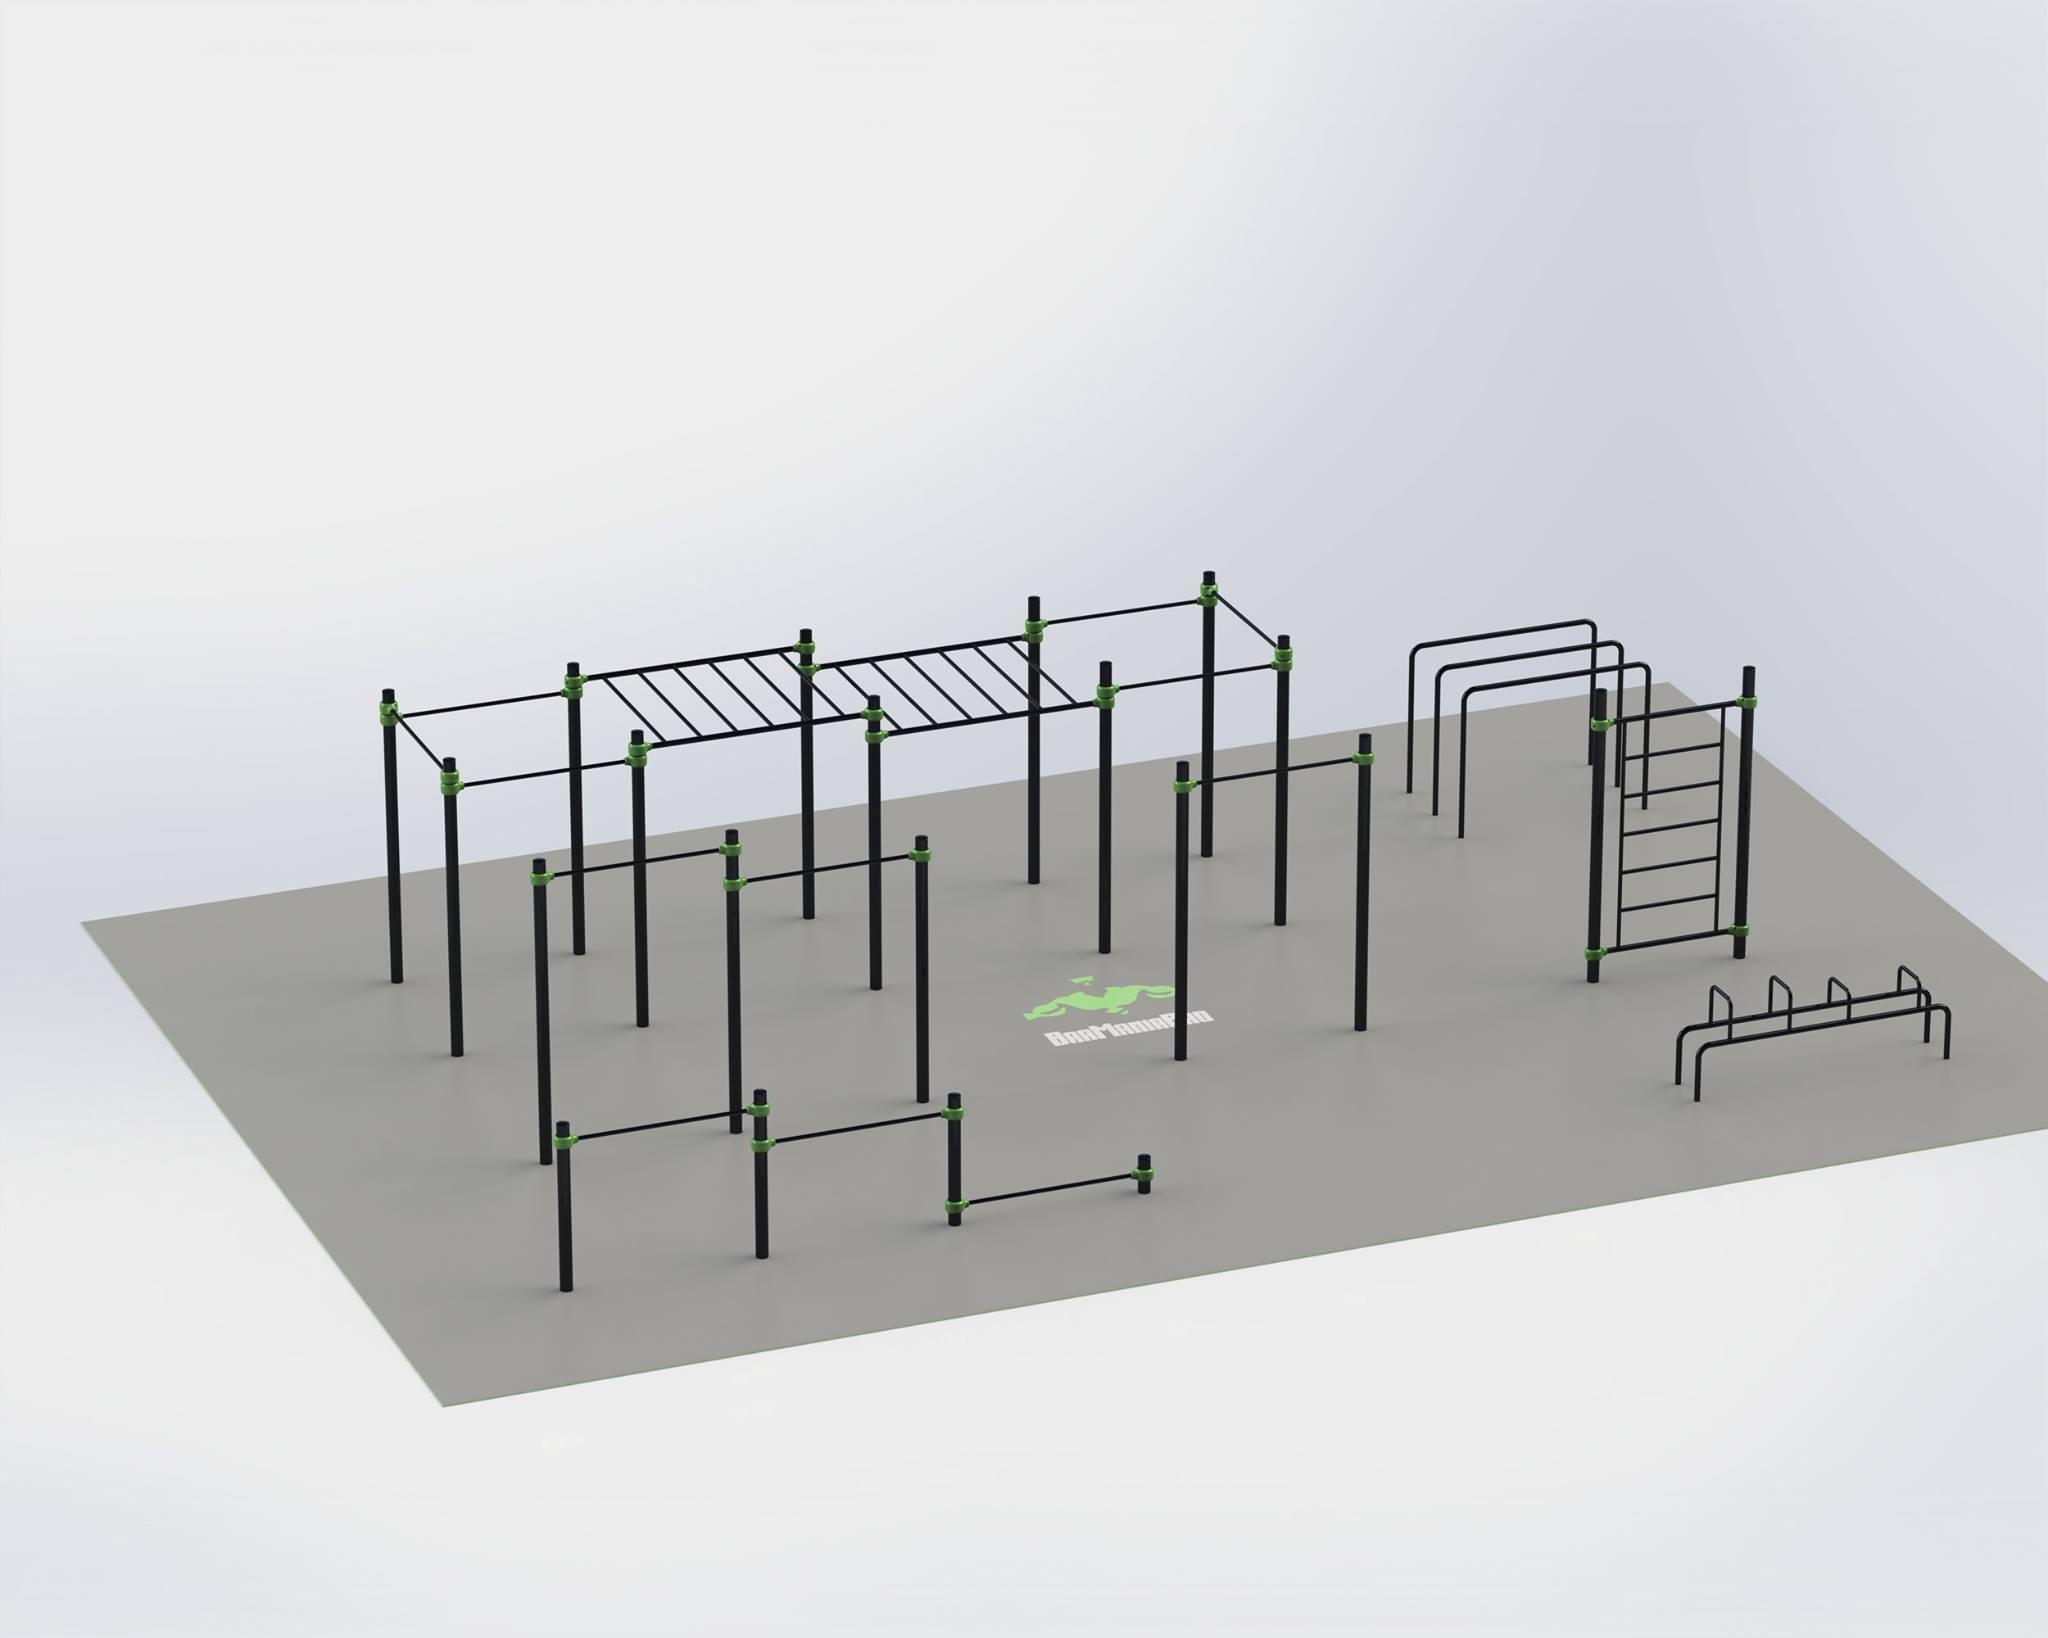 inauguration du parc de street workout barmaniapro. Black Bedroom Furniture Sets. Home Design Ideas